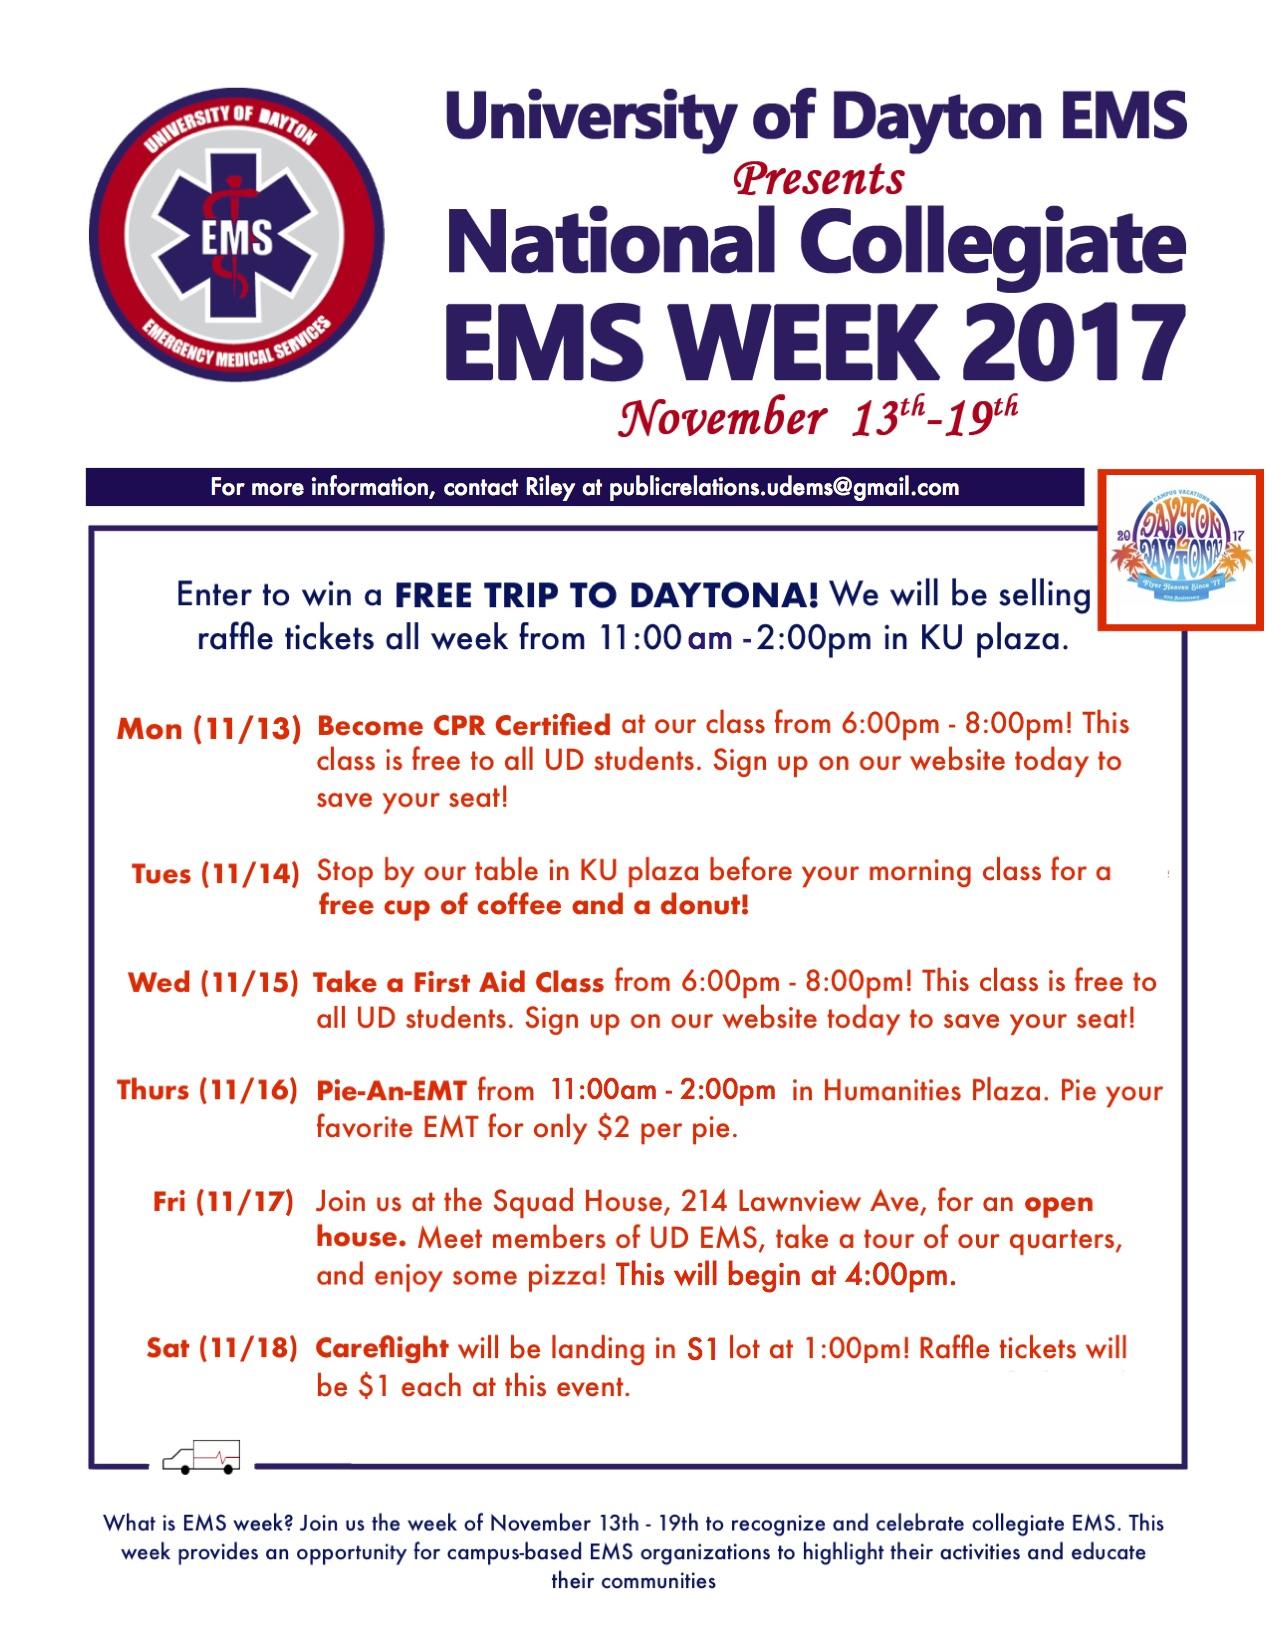 Collegiate ems week university of dayton ohio collegiate ems week 1betcityfo Choice Image